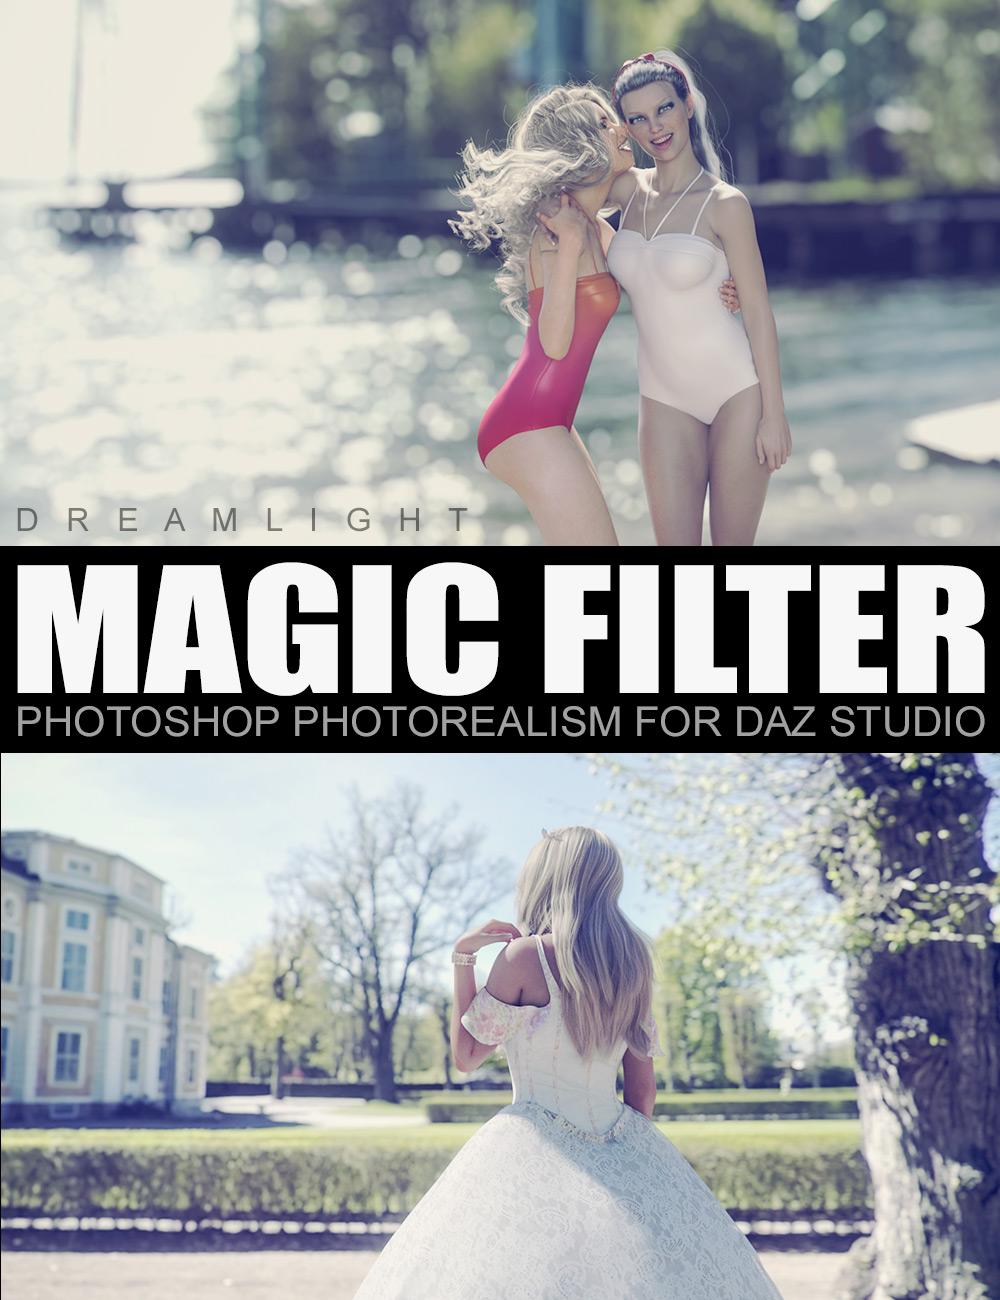 Magic Filter - Photoshop Photorealism for Daz Studio by: Dreamlight, 3D Models by Daz 3D